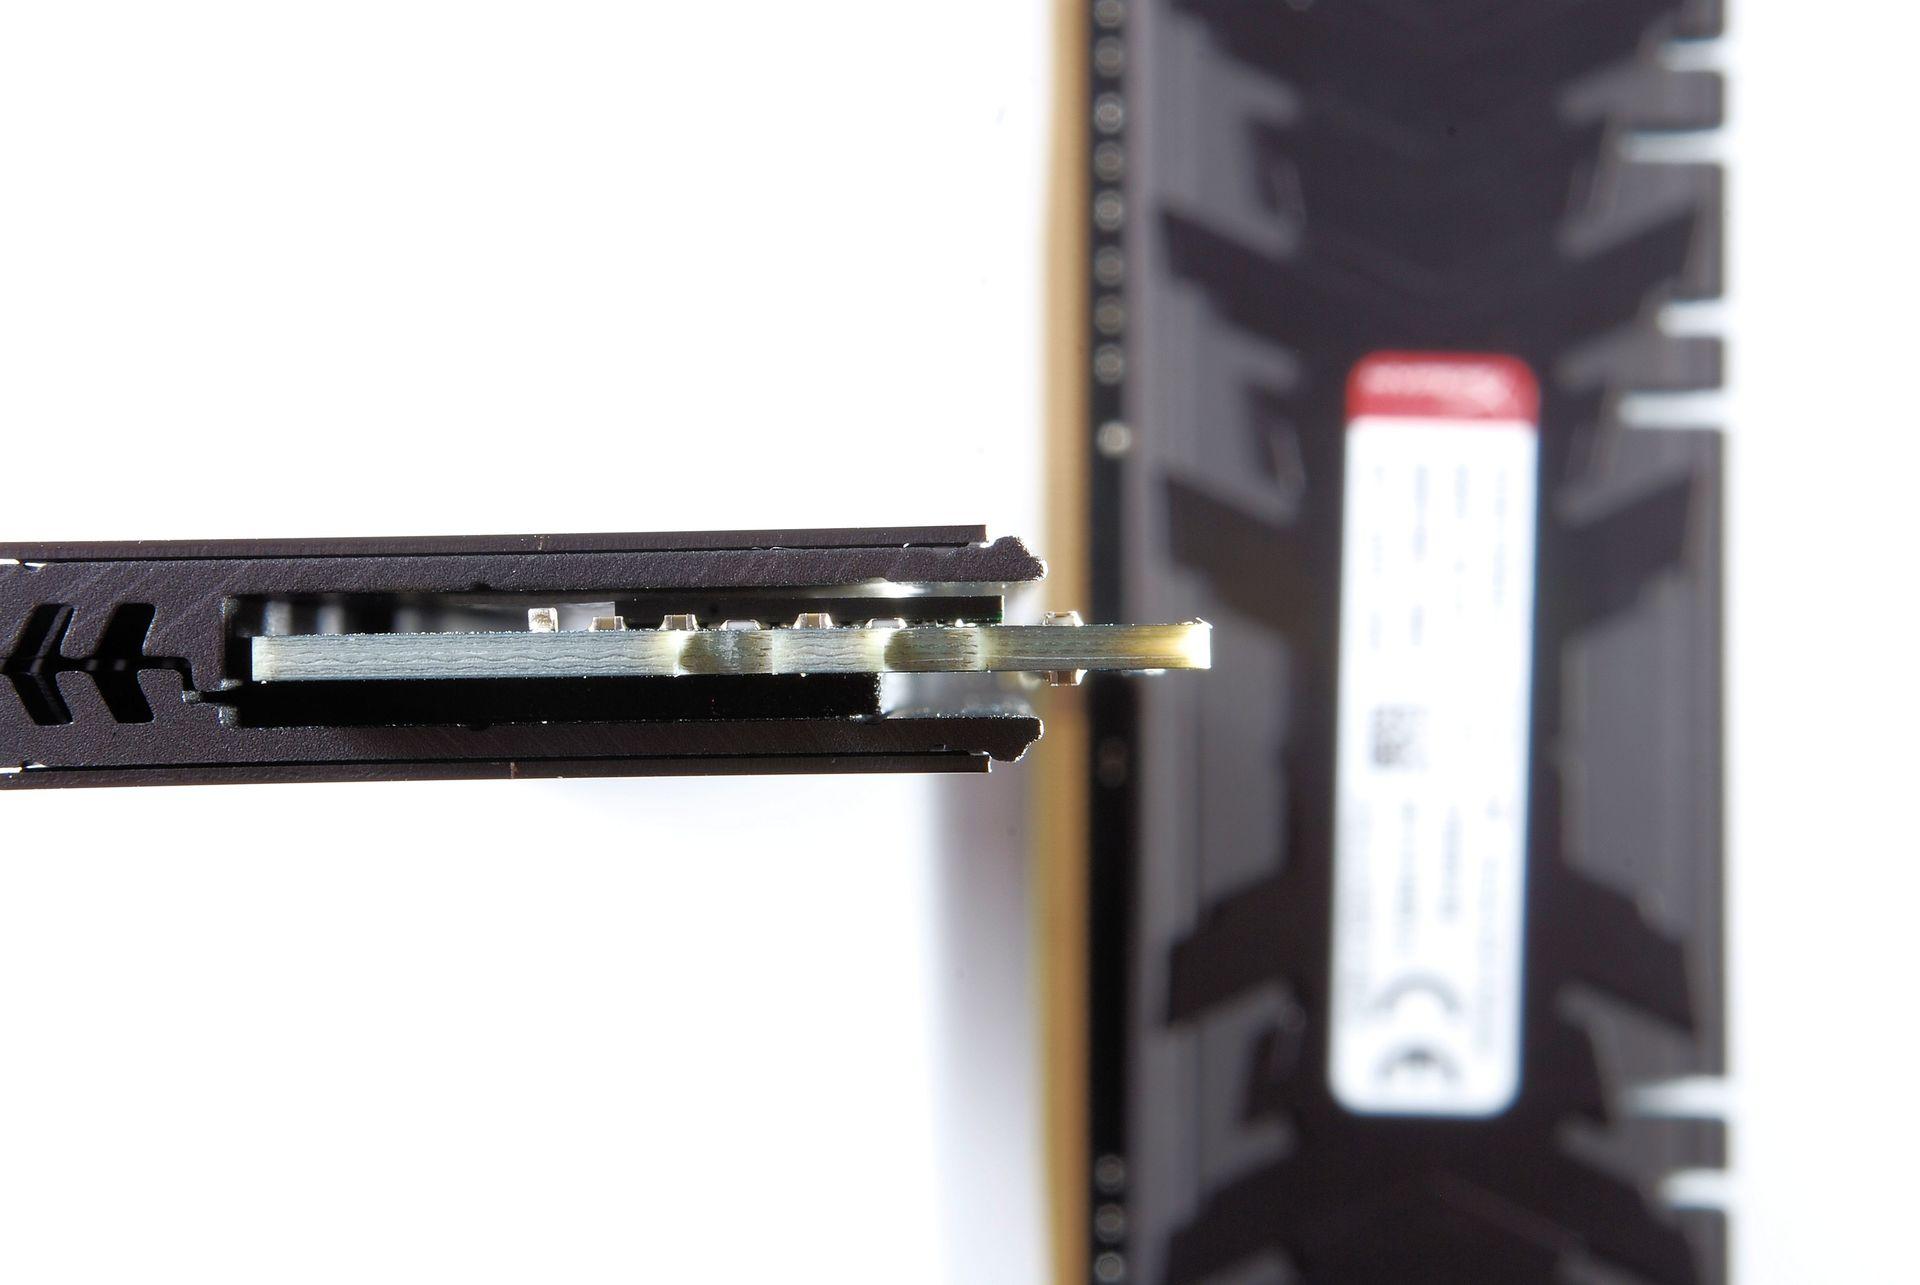 Обзор комплекта памяти HyperX Predator DDR4-3000 - 6